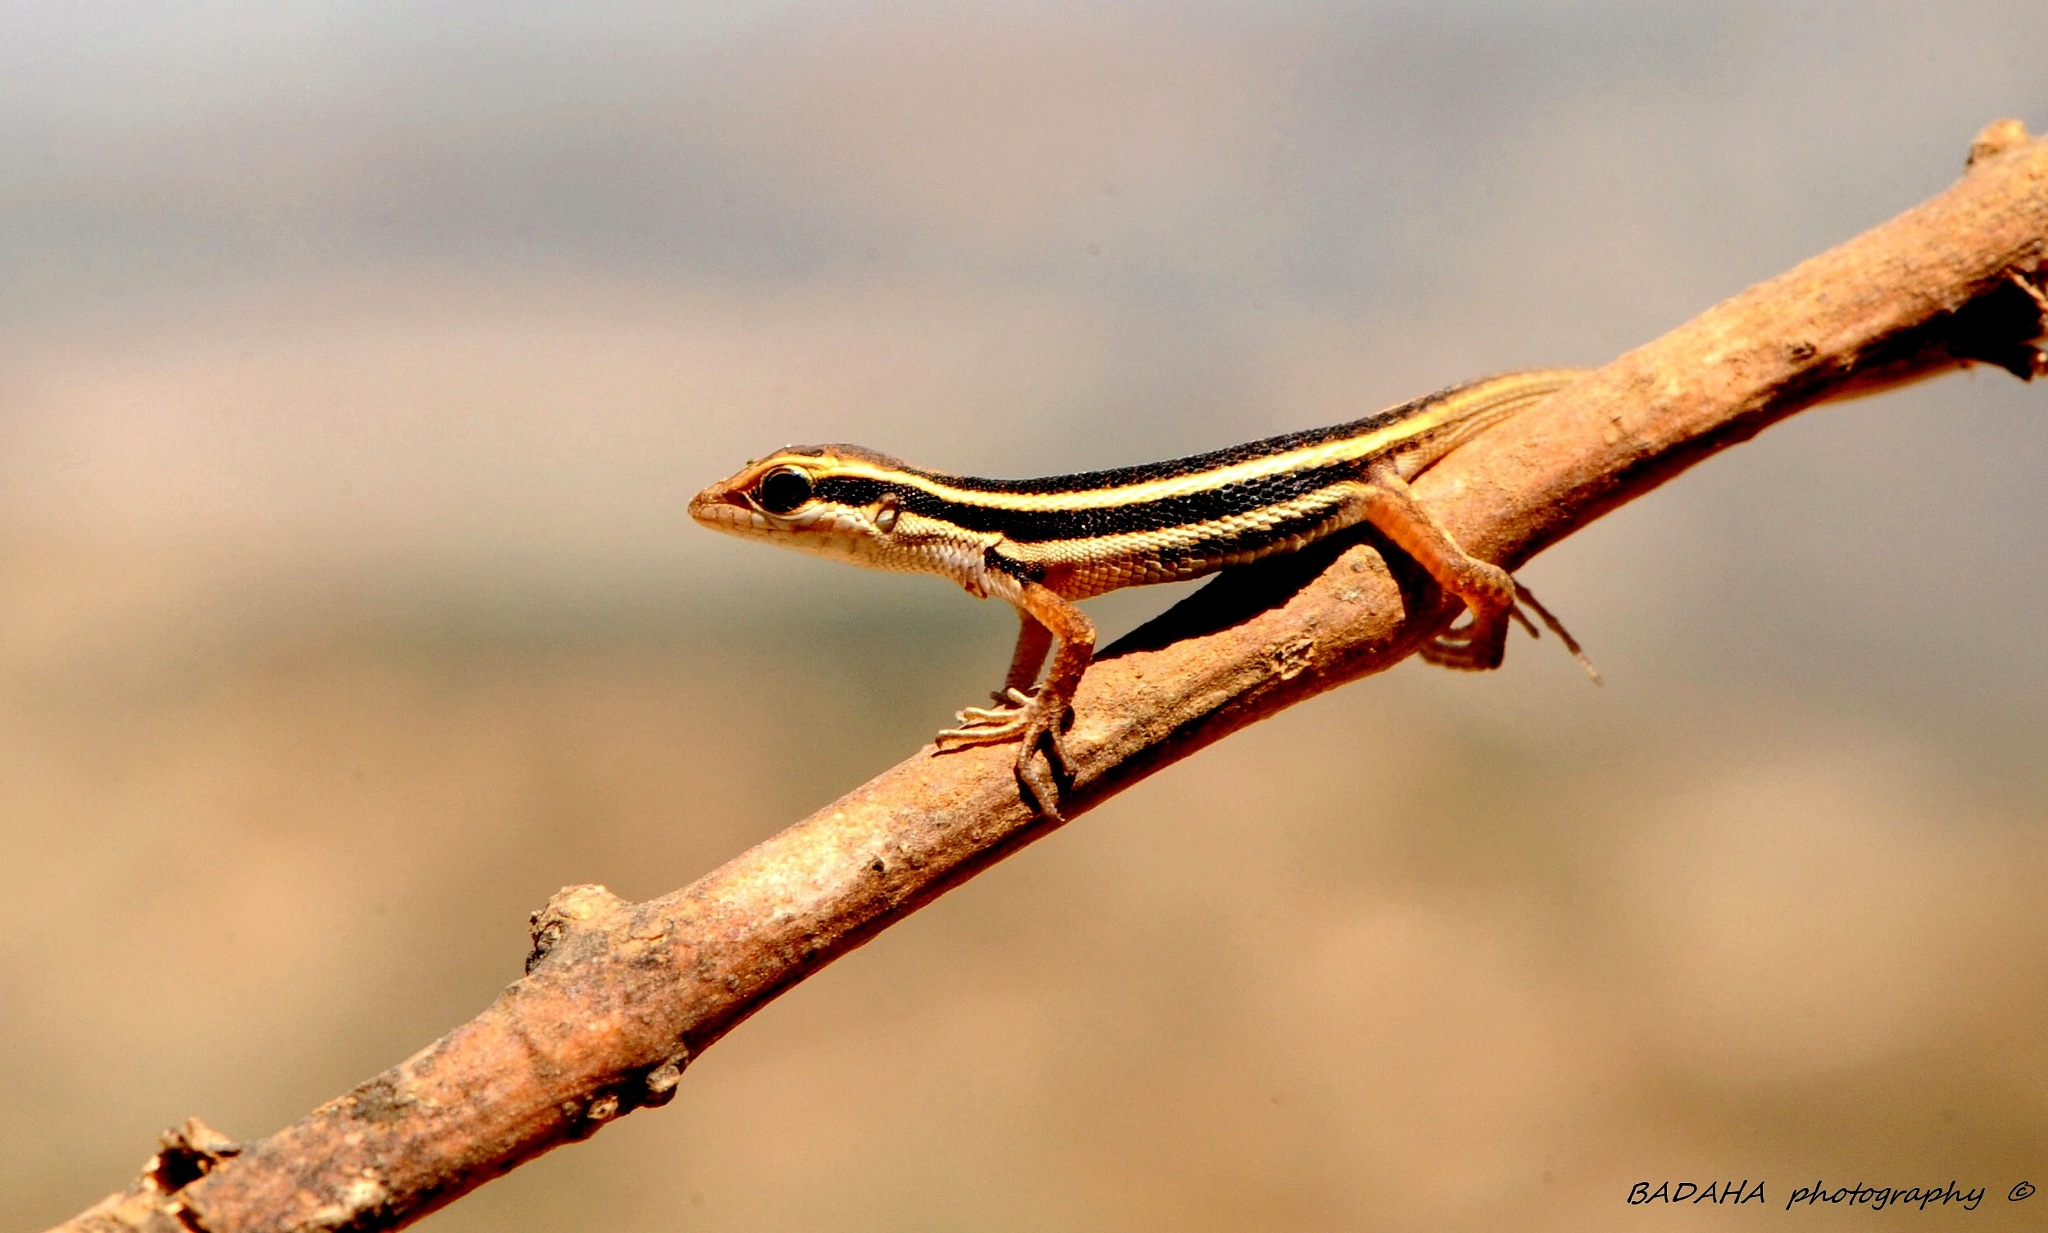 lizard  by Mohammad Badaha